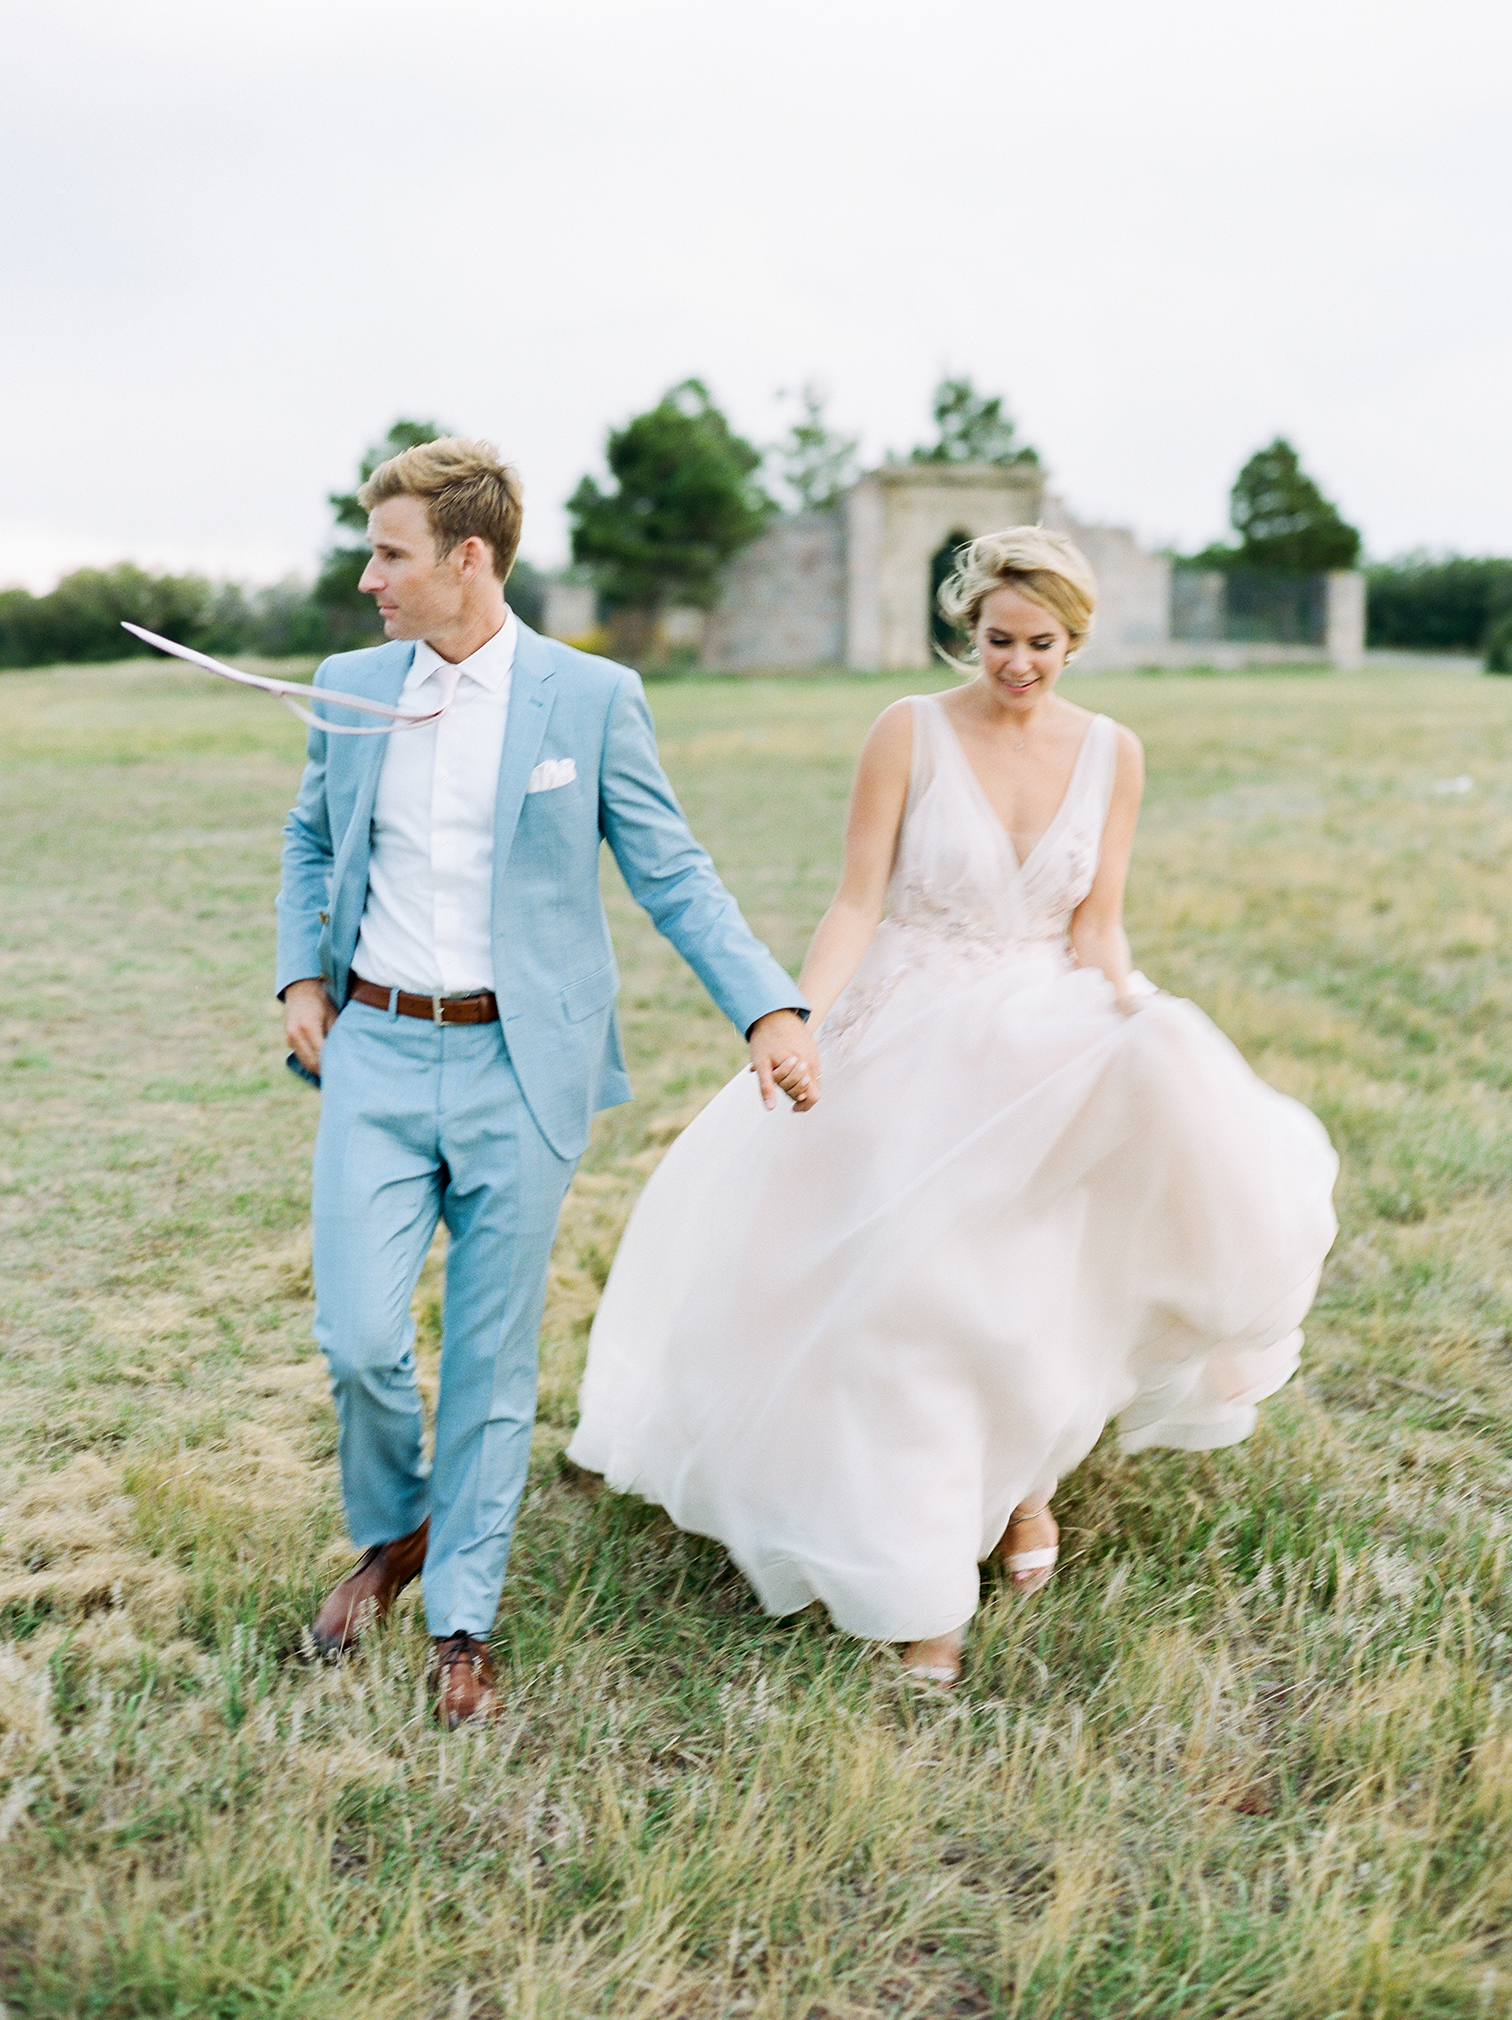 Colorado Wedding Photographers, How to Plan a Destination Wedding, Denver Wedding Photos